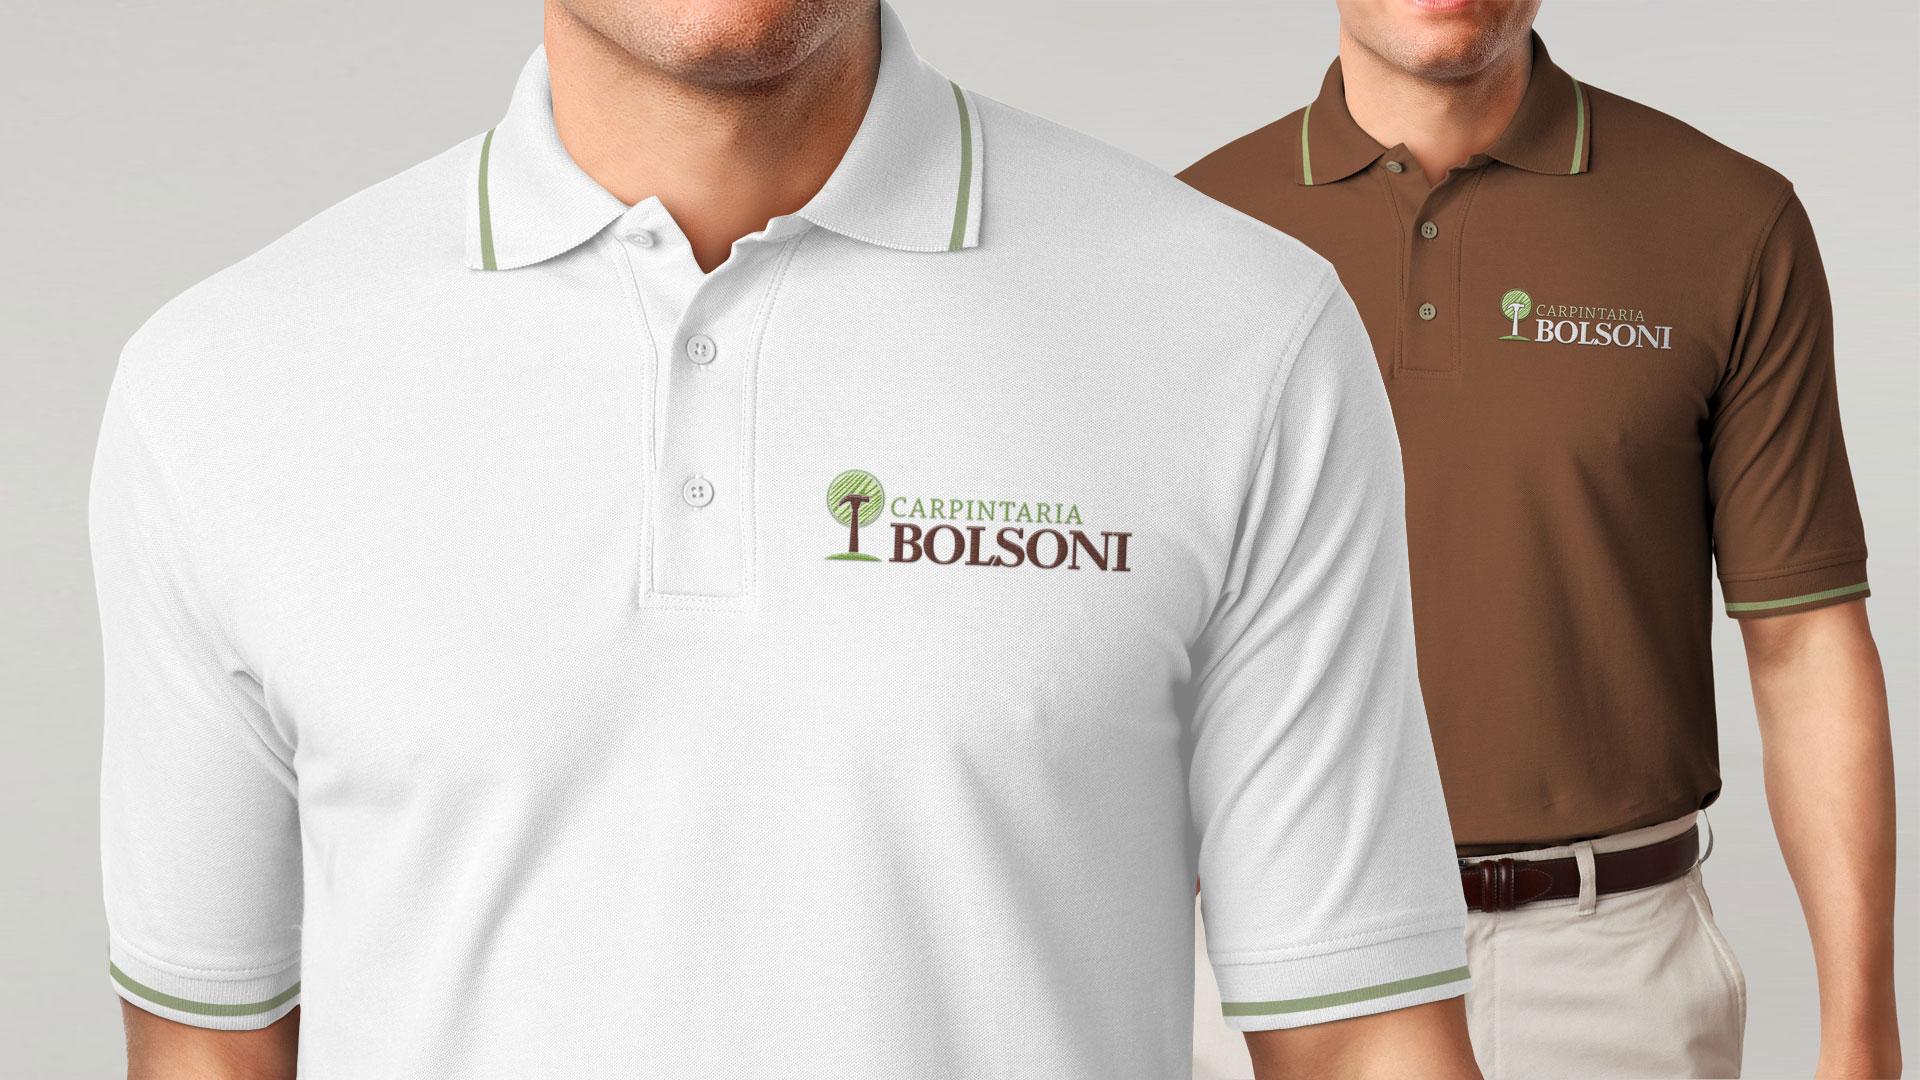 Carpintaria Bolsoni